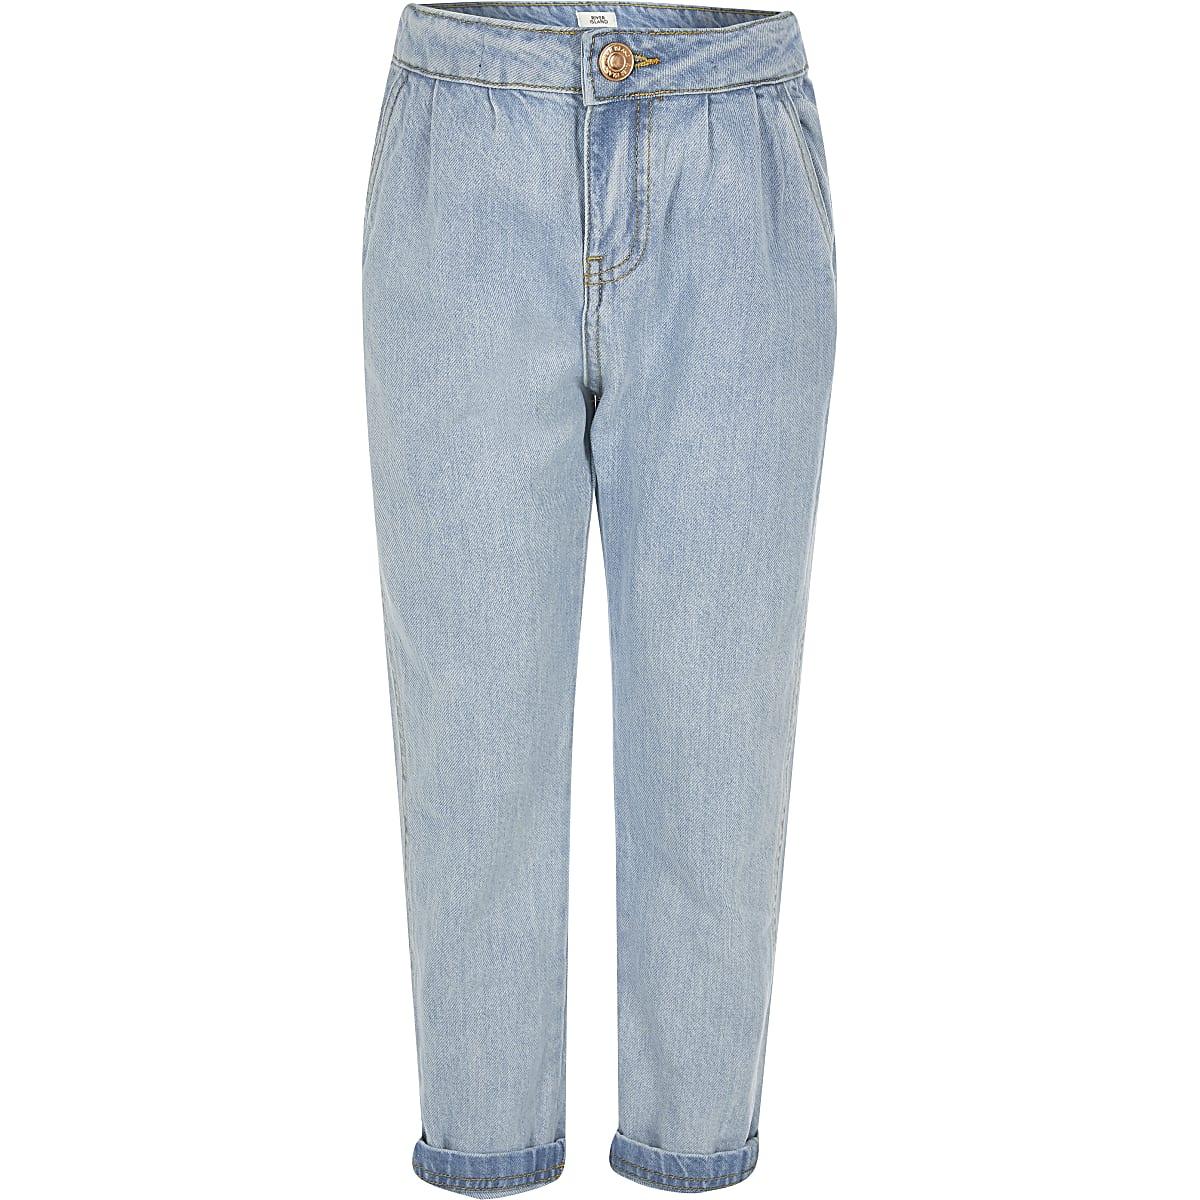 Girls blue mom jeans